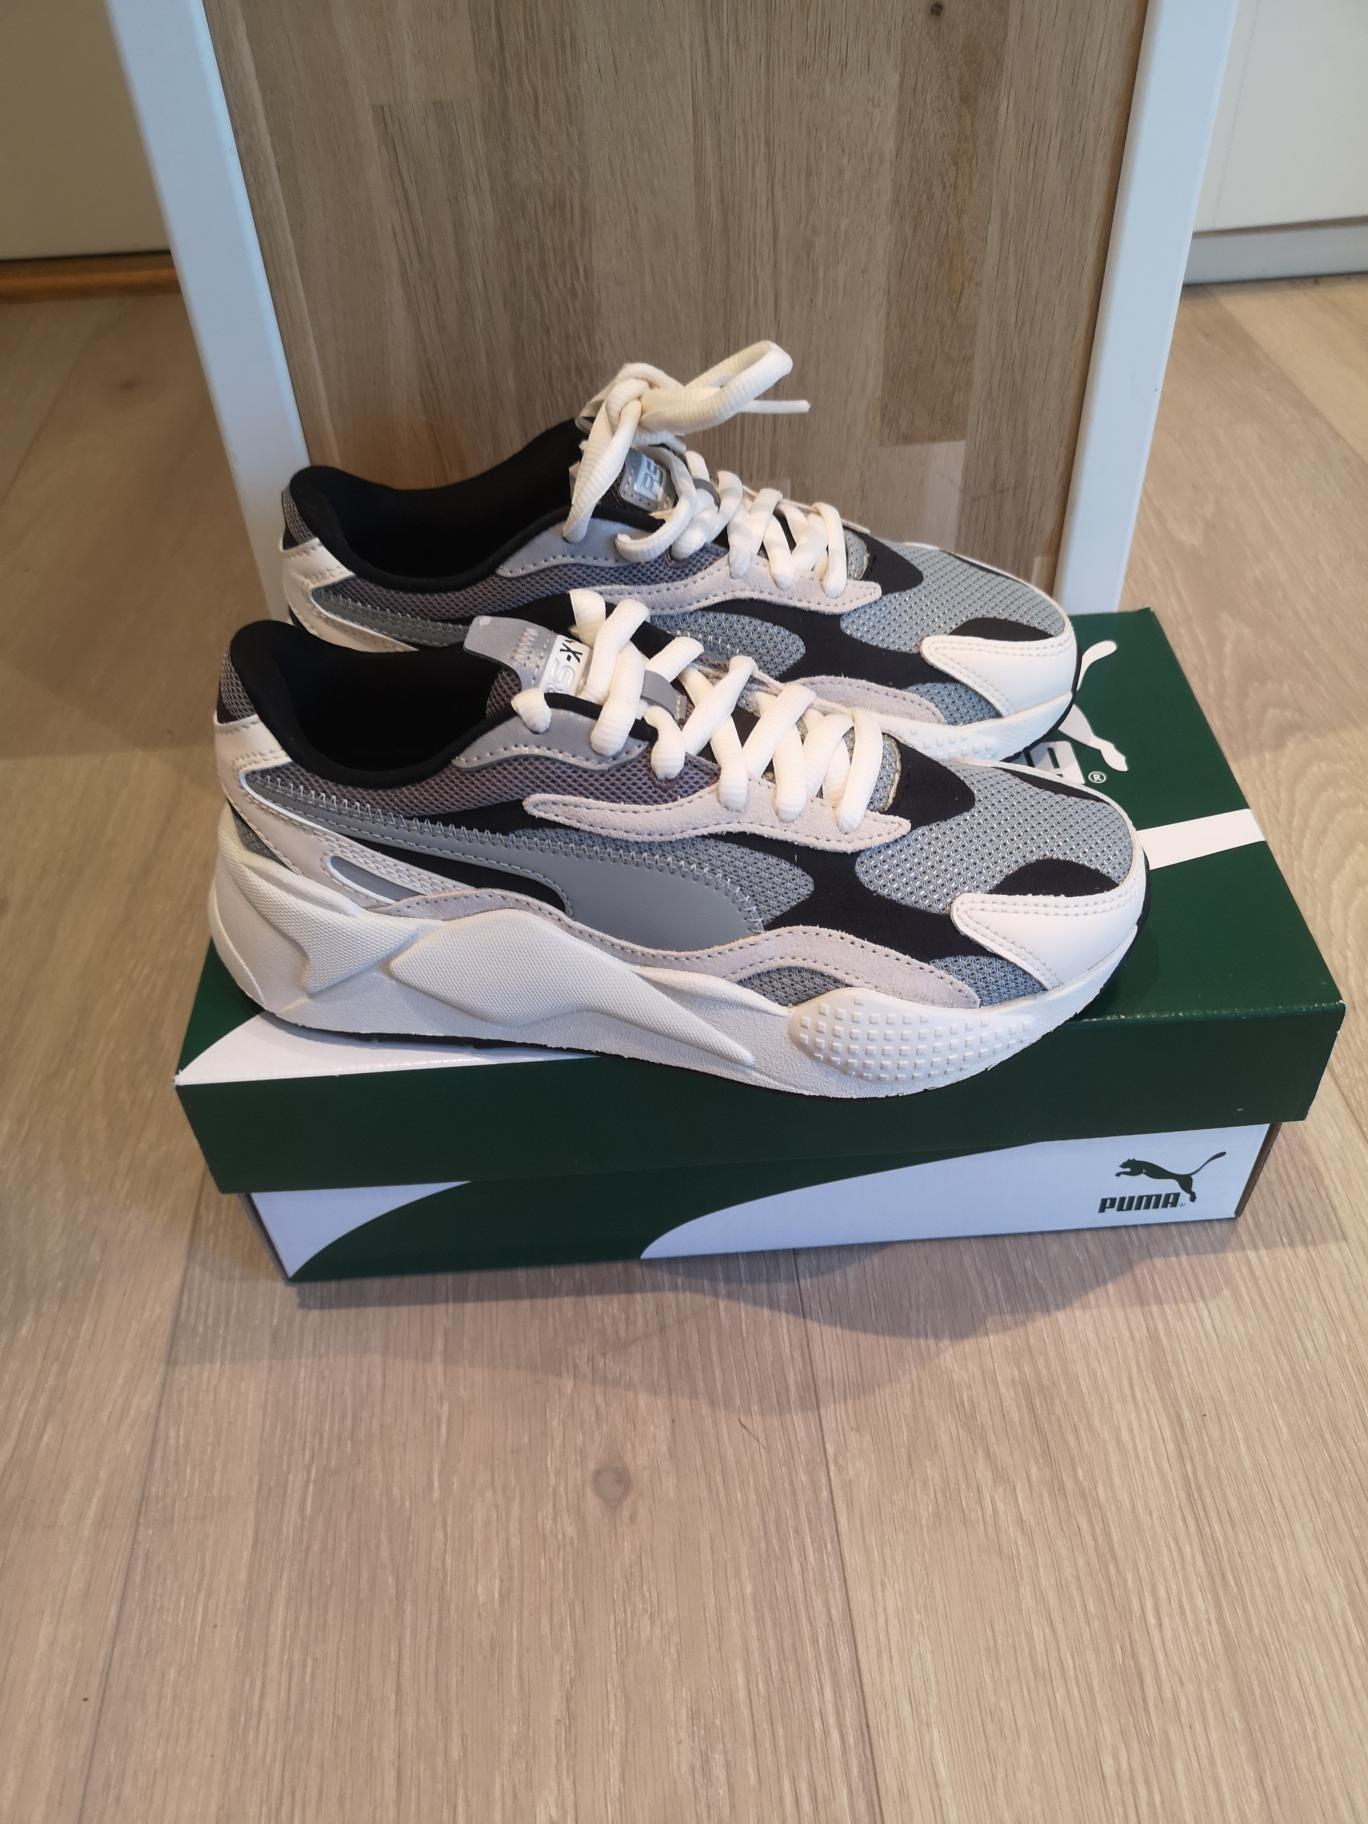 Puma RS X sneakers | FINN.no